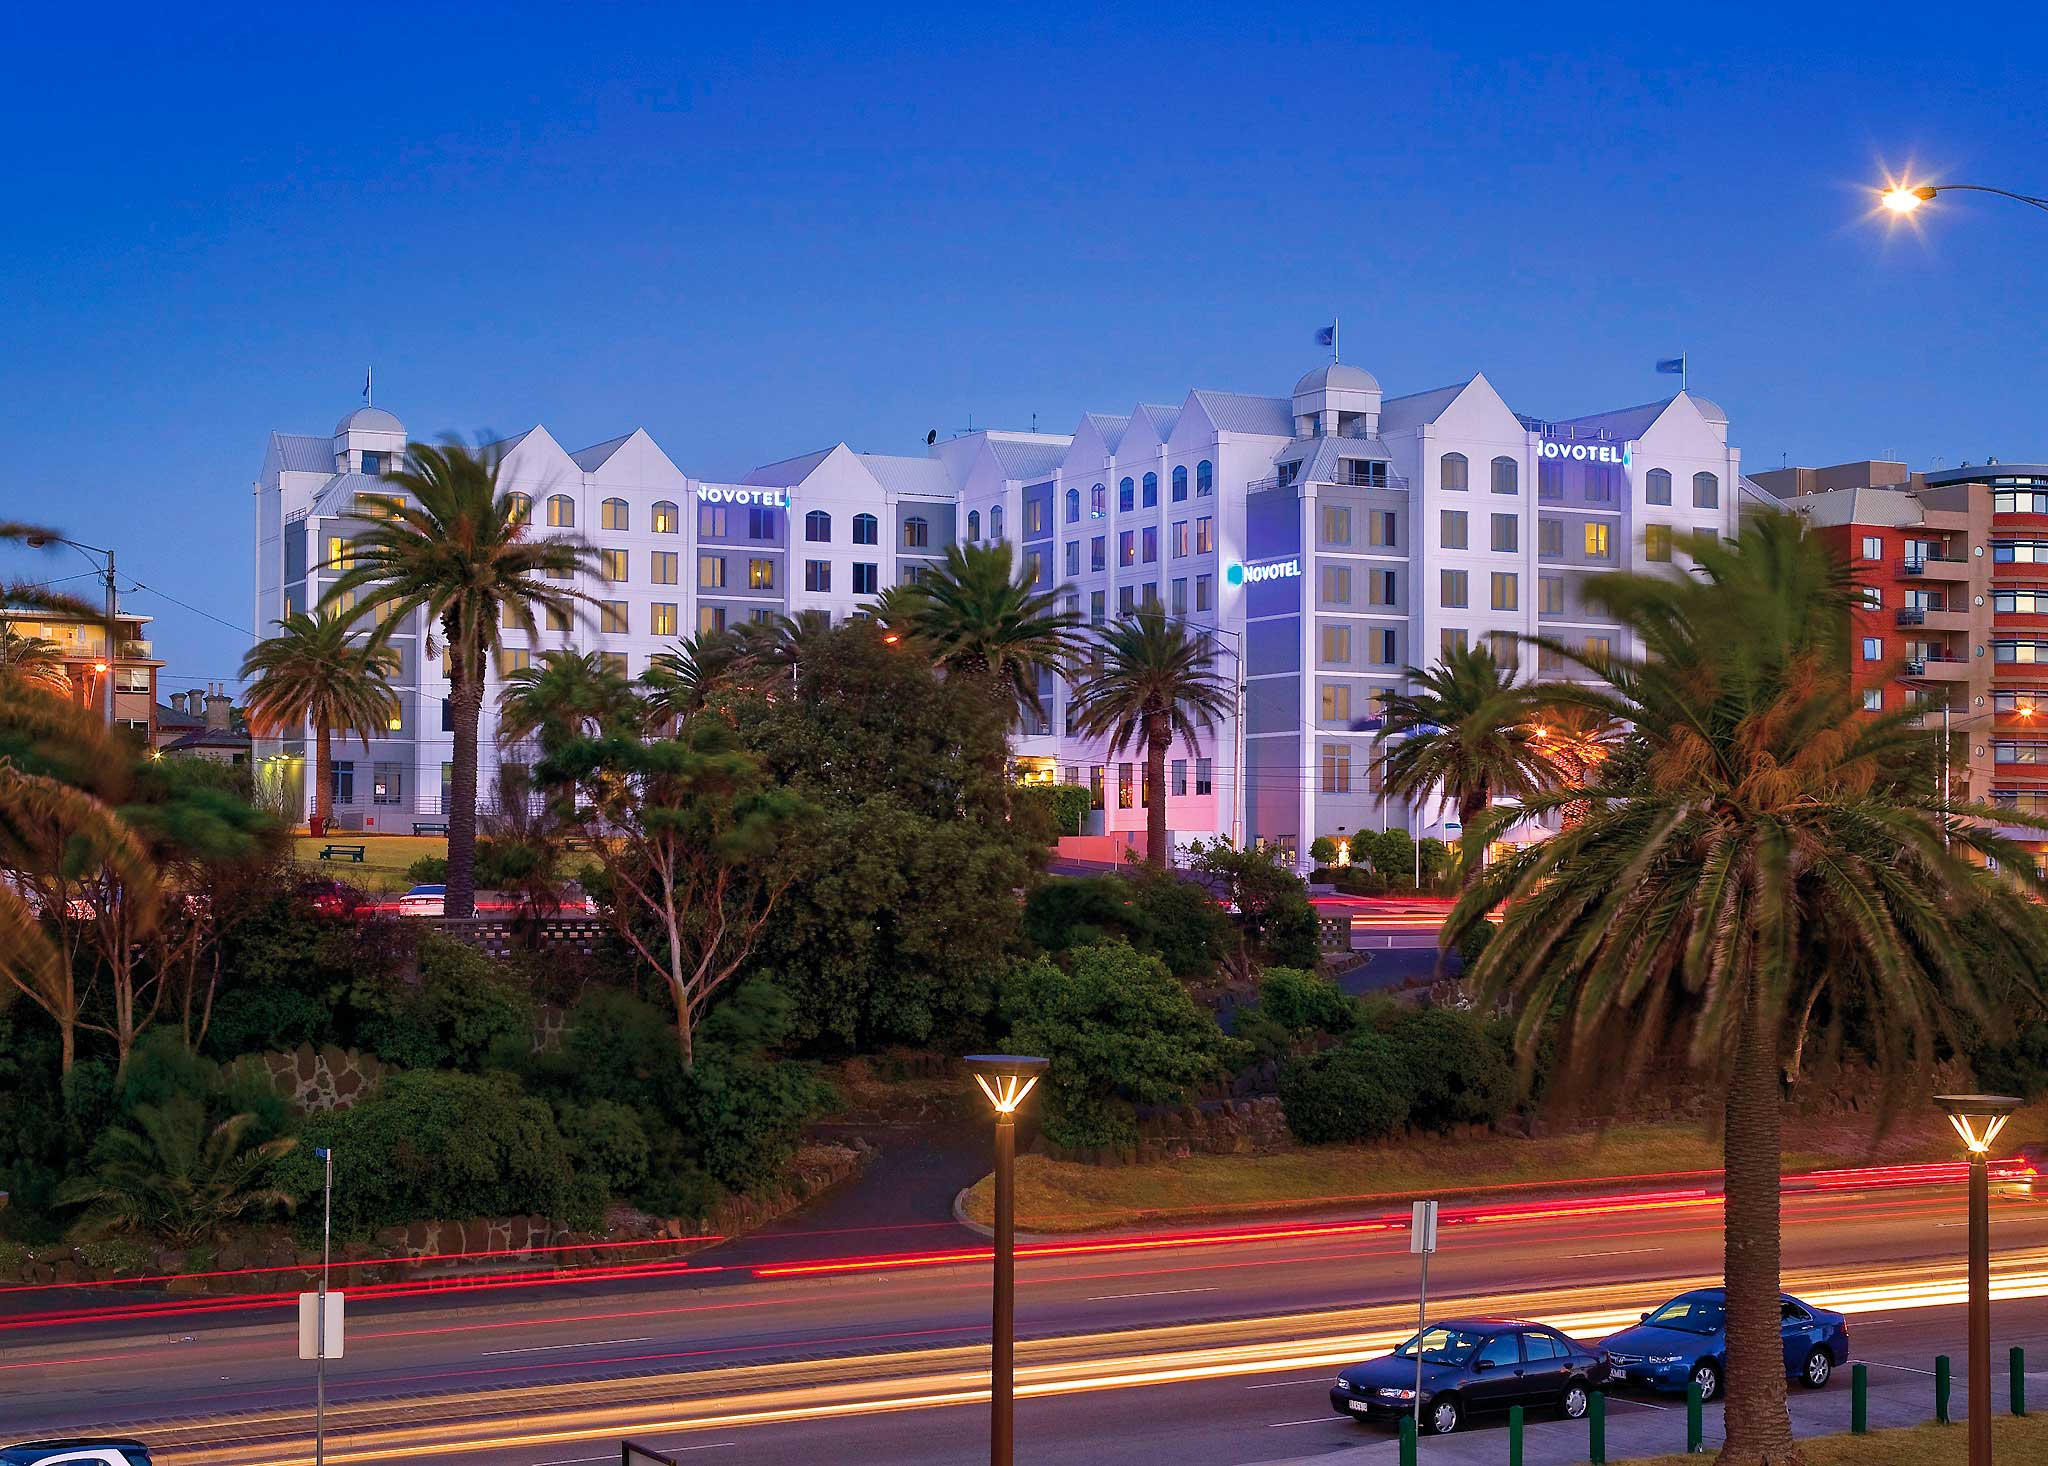 Hotel - Novotel Melbourne St Kilda